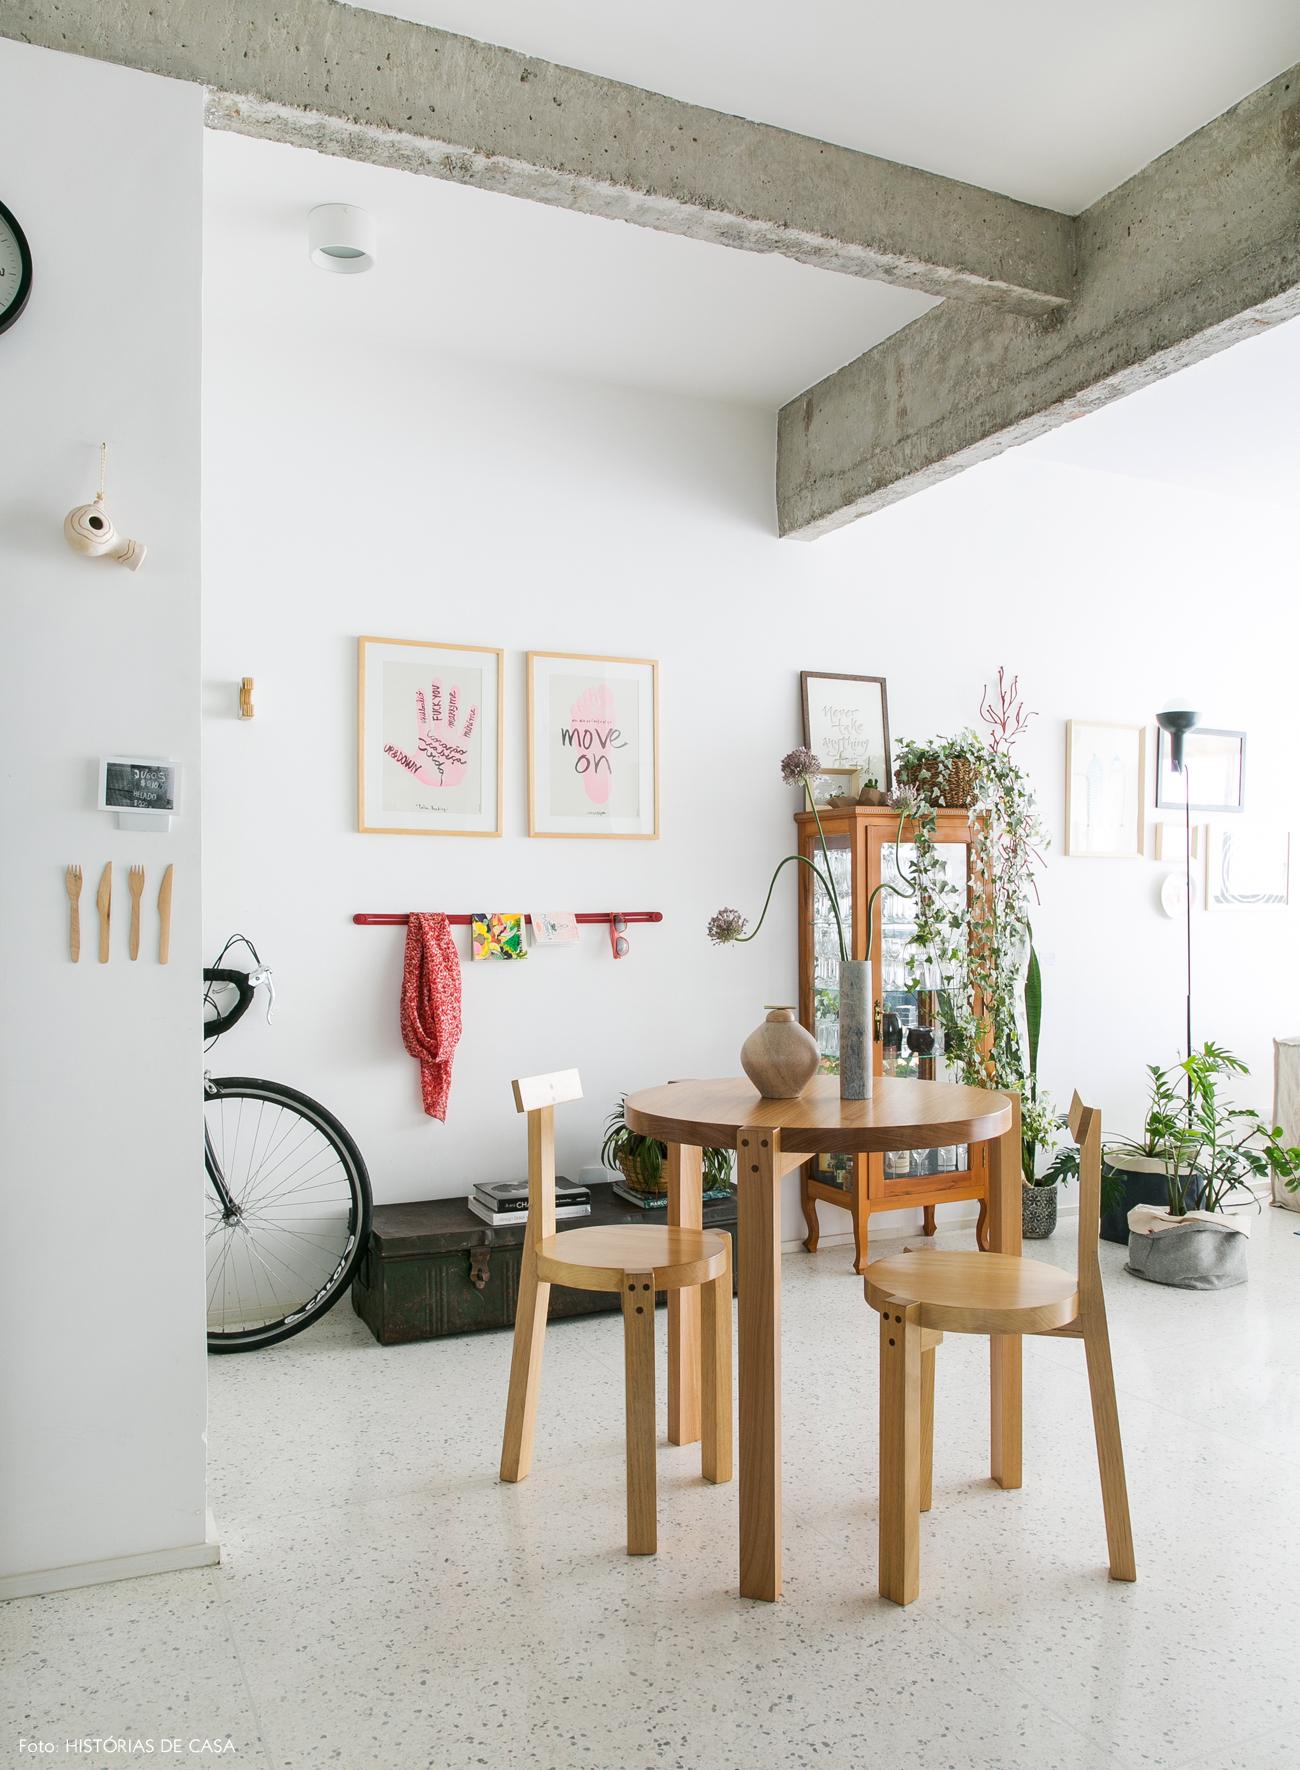 19-decoracao-apartamento-cozinha-piso-granilite-branco-concreto